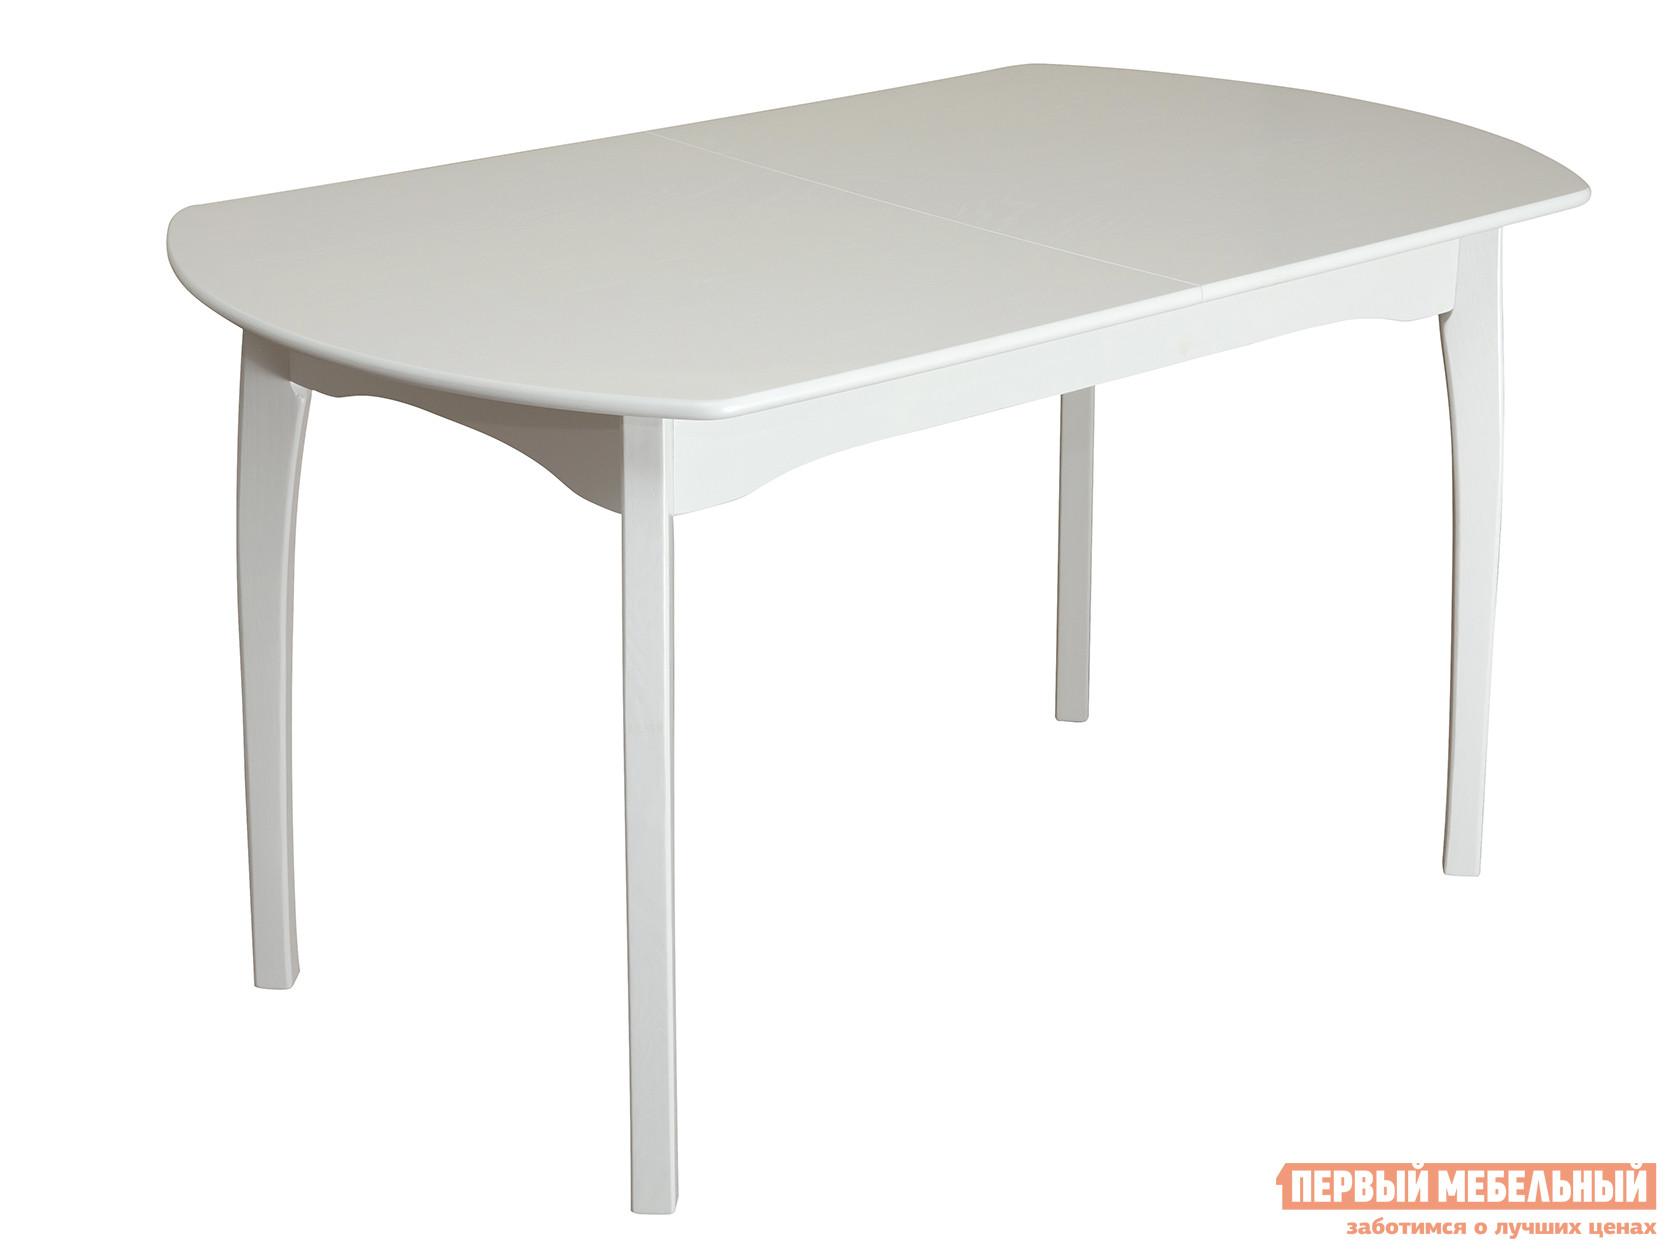 Кухонный стол  Модерн-2 Белый Mebwill 91339